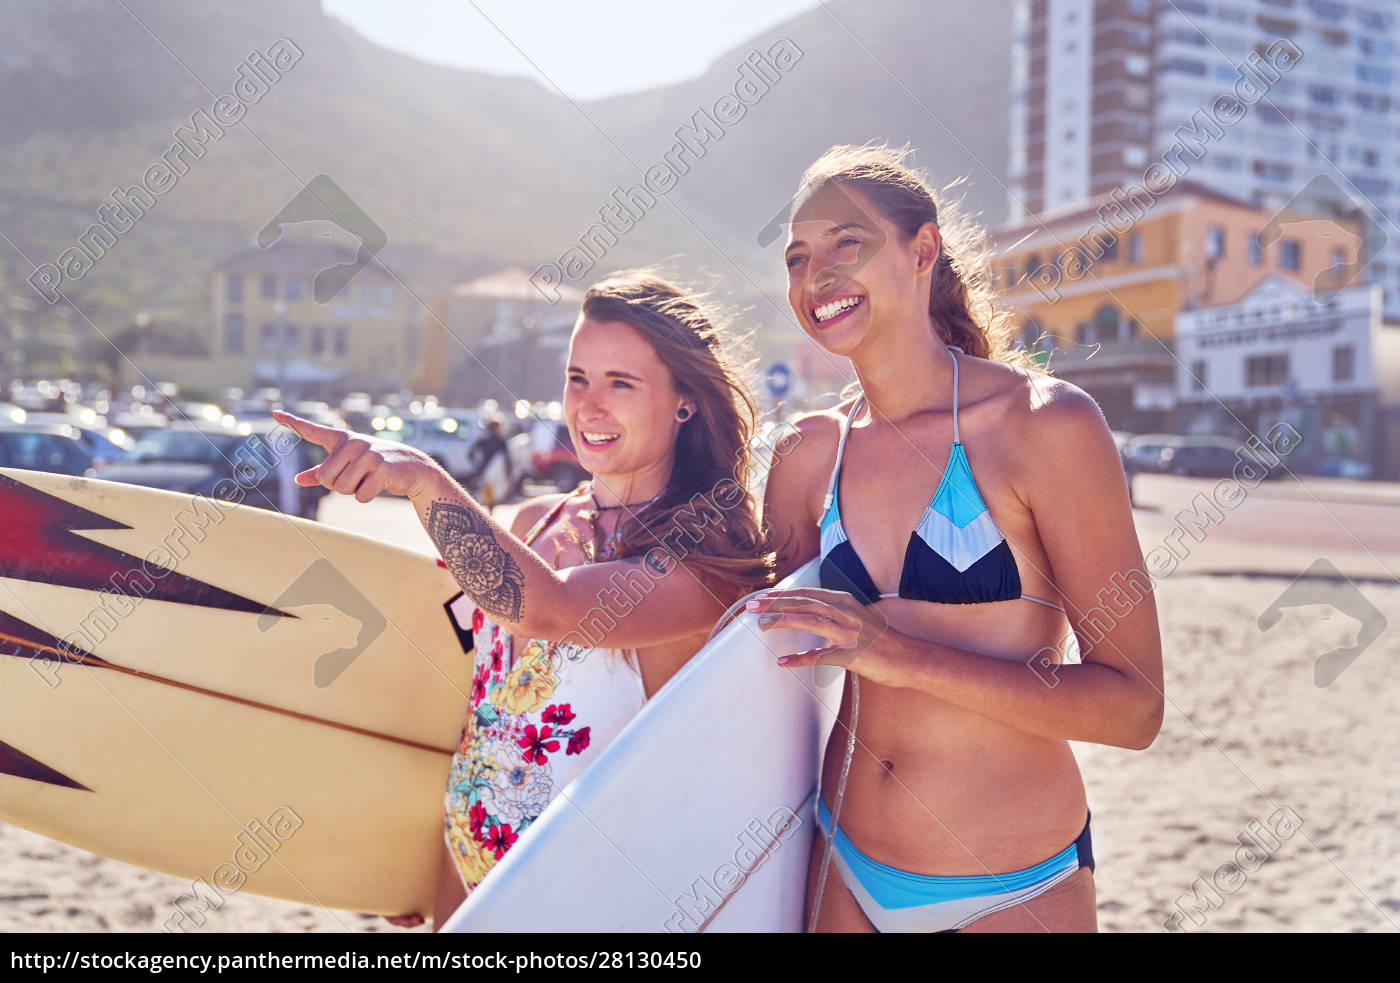 felici, giovani, donne, surfiste, con, tavole - 28130450